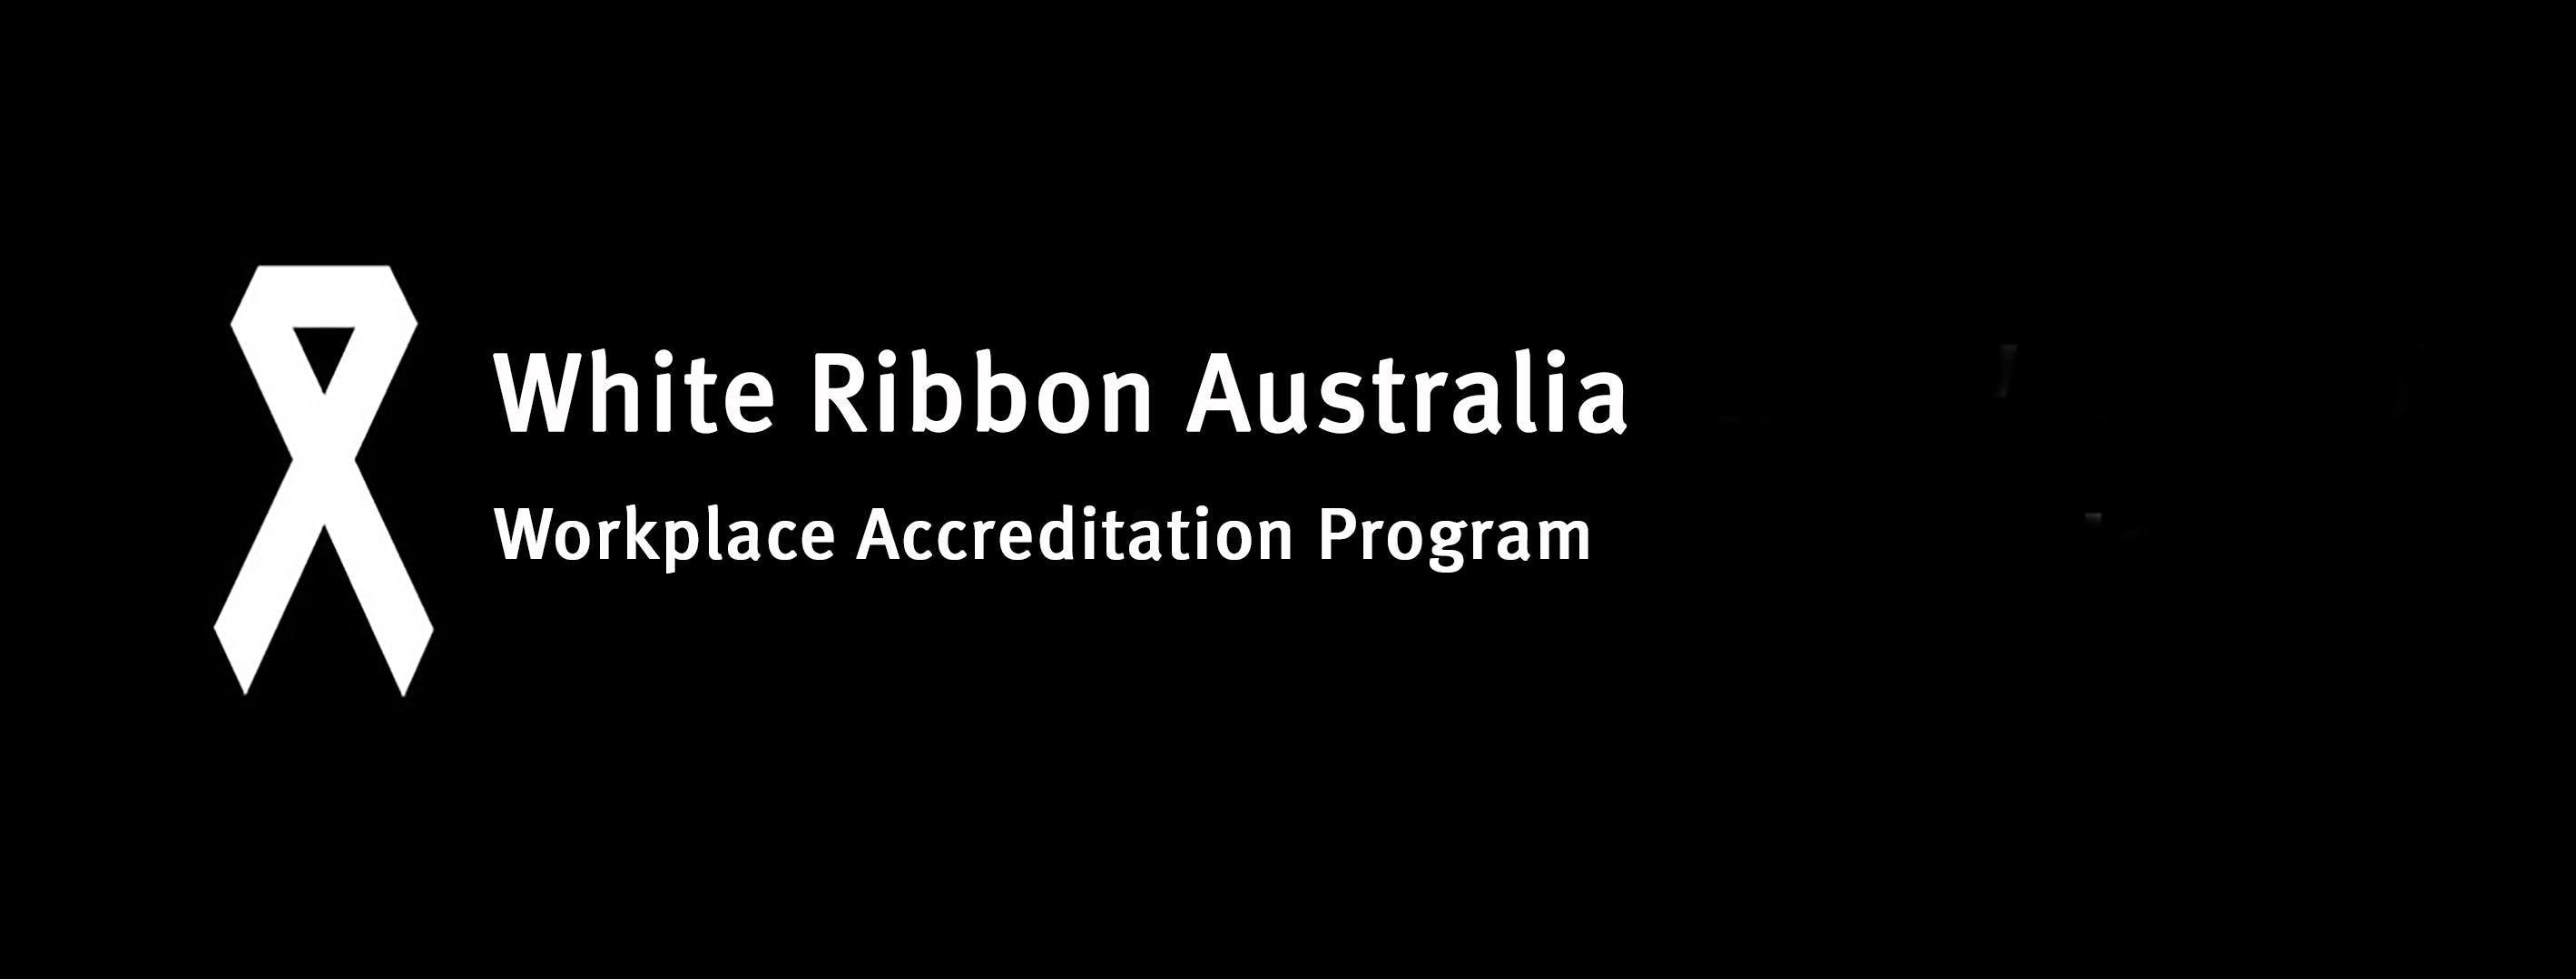 White Ribbon Australia Workplace Accreditatio